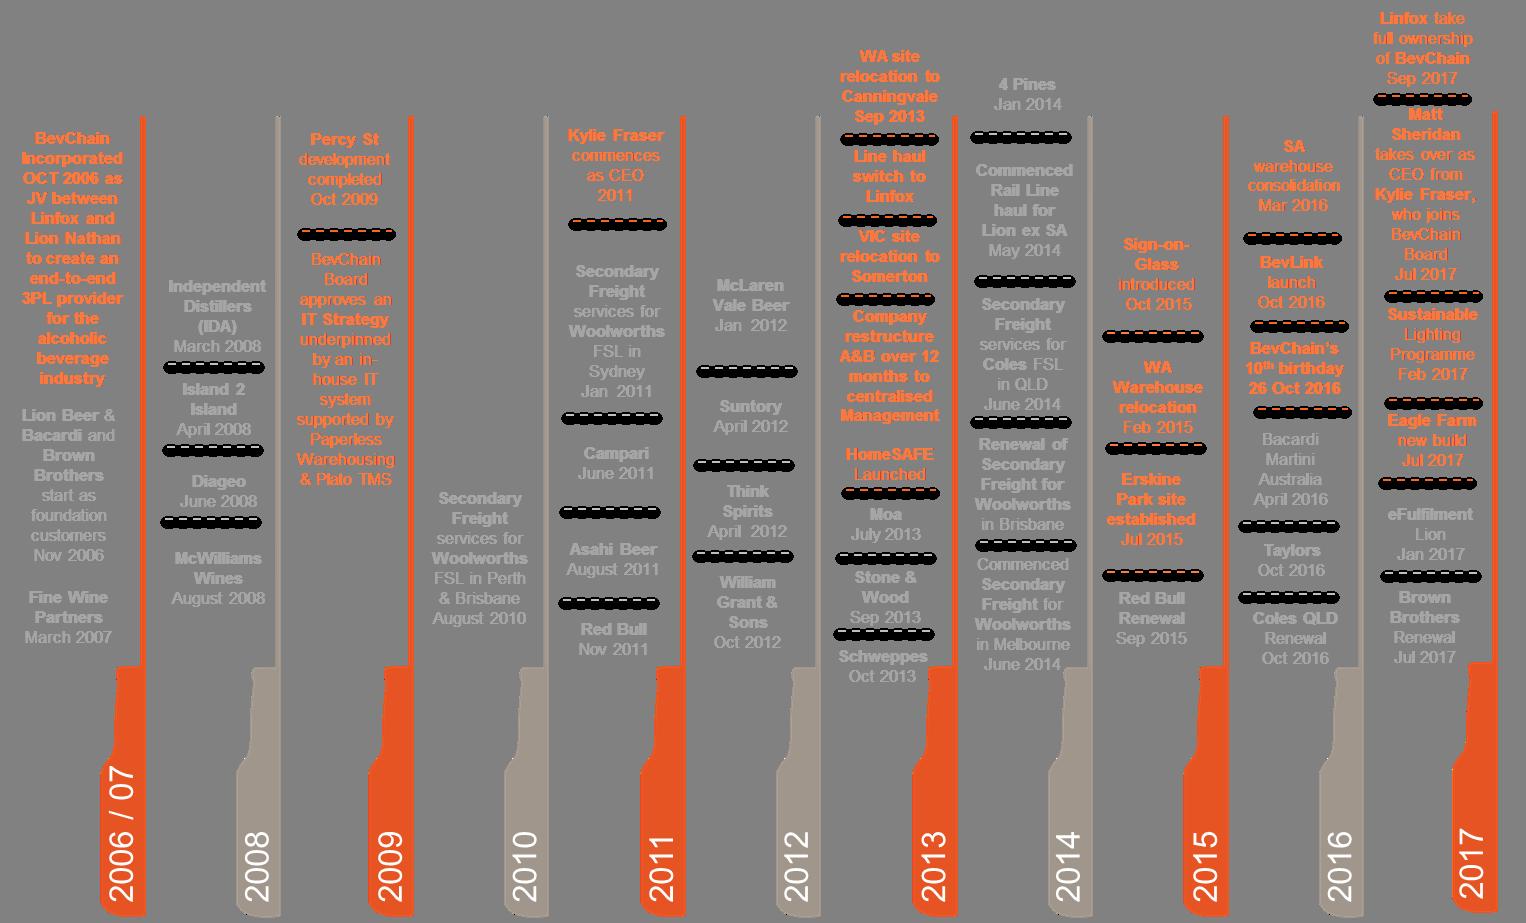 Bevchain history timeline